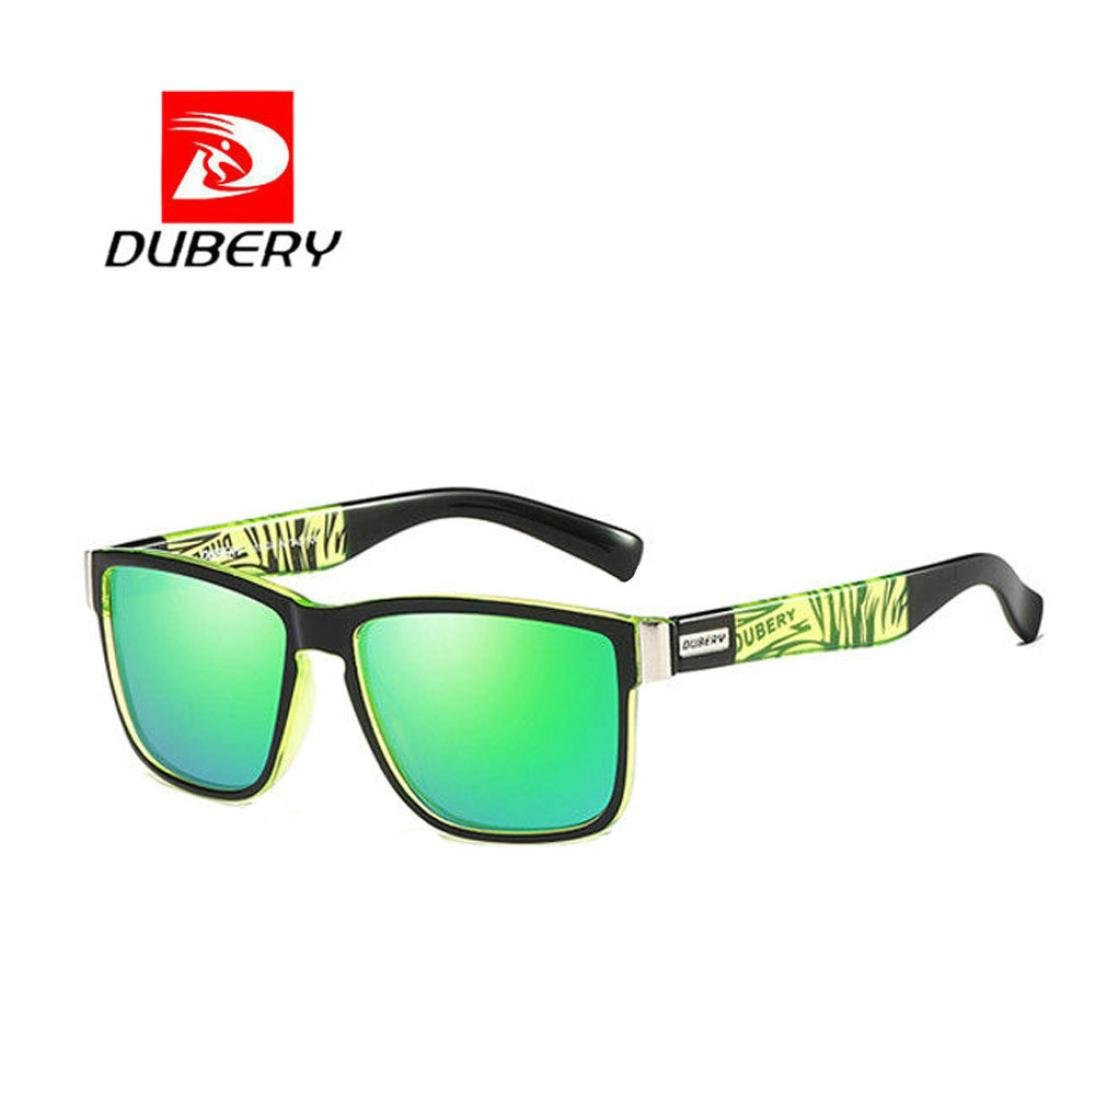 ca54171106a DUBERY Sunglasses Men s Polarized Sunglasses Outdoor Driving Men Women  Sport Frame Fishing Hunting Boating Glasses New